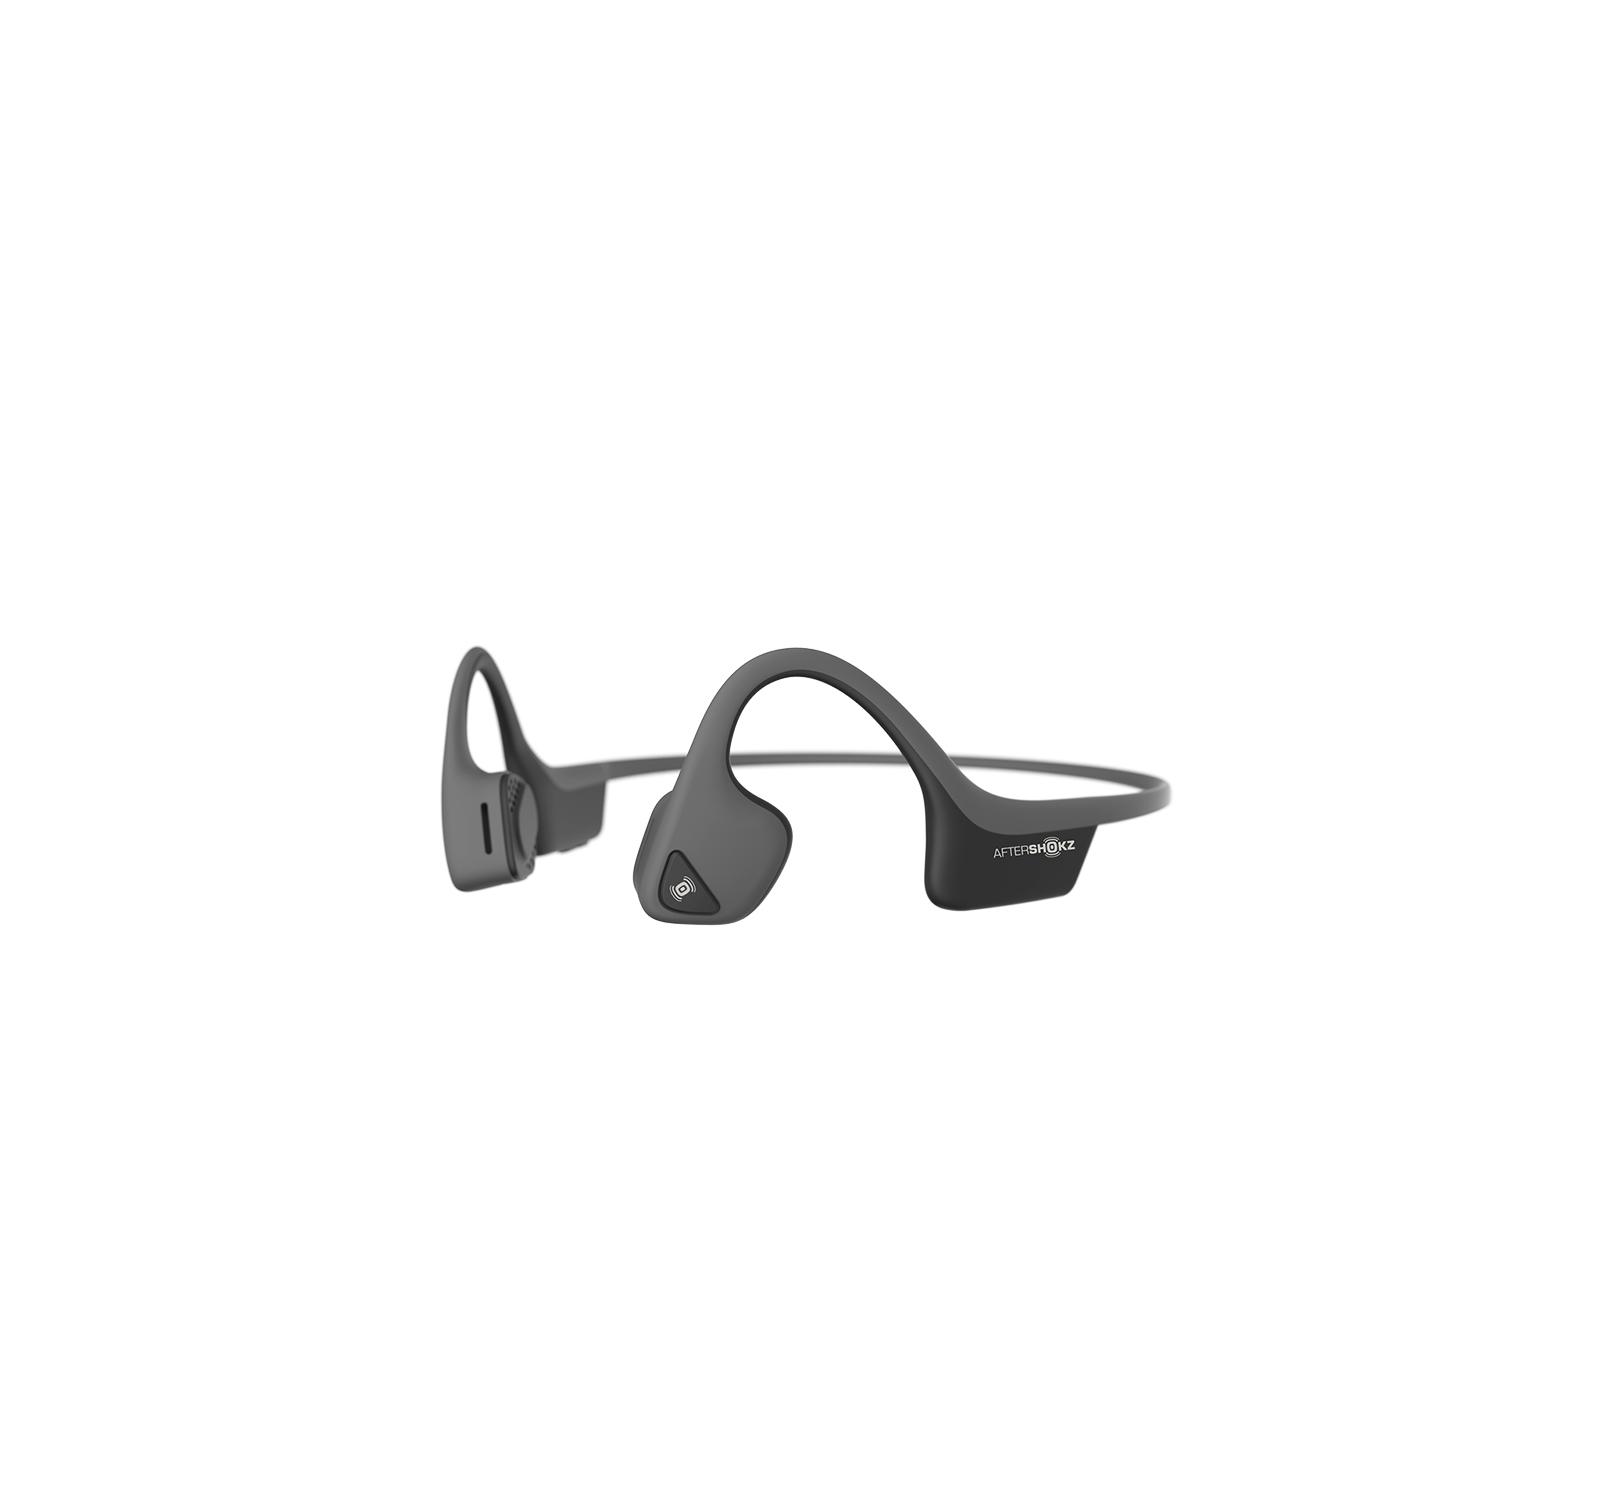 AfterShokz-Trekz-Air-Wireless-Bone-Conduction-Headphones thumbnail 12